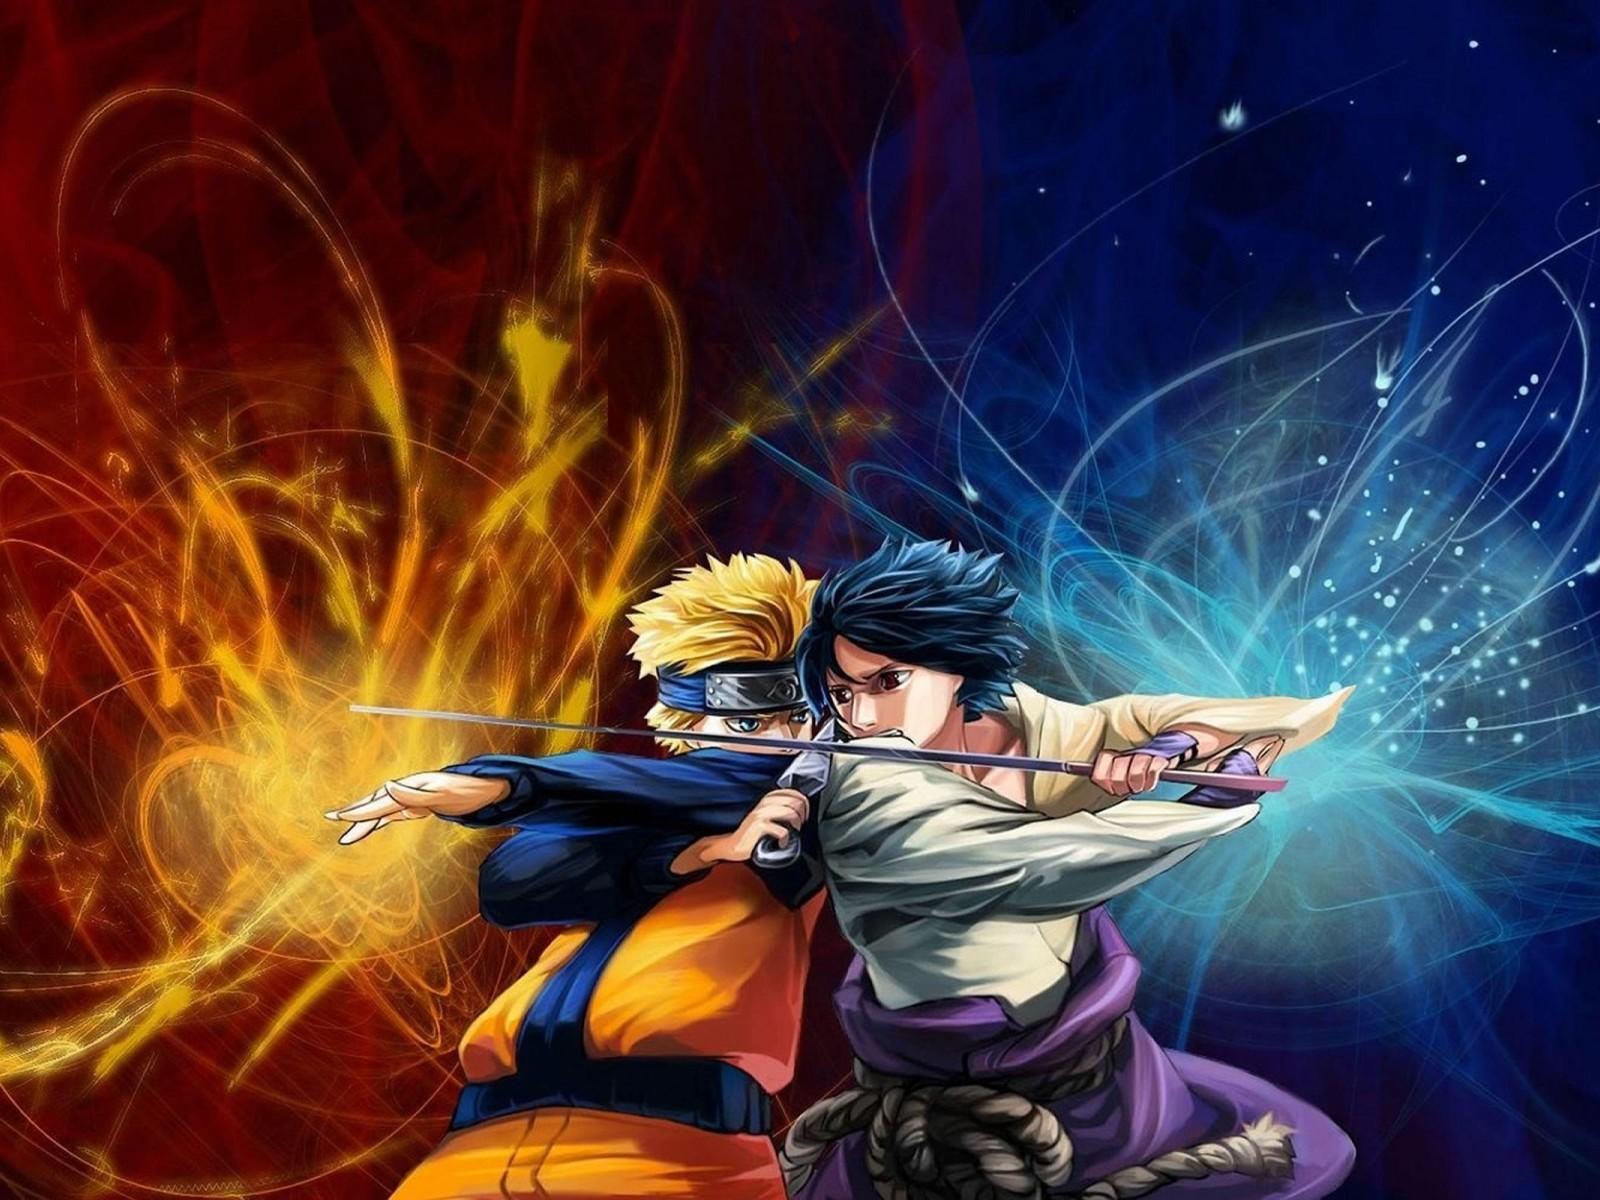 High Resolution Wallpaper Naruto Shippuden Wallpapers-1341